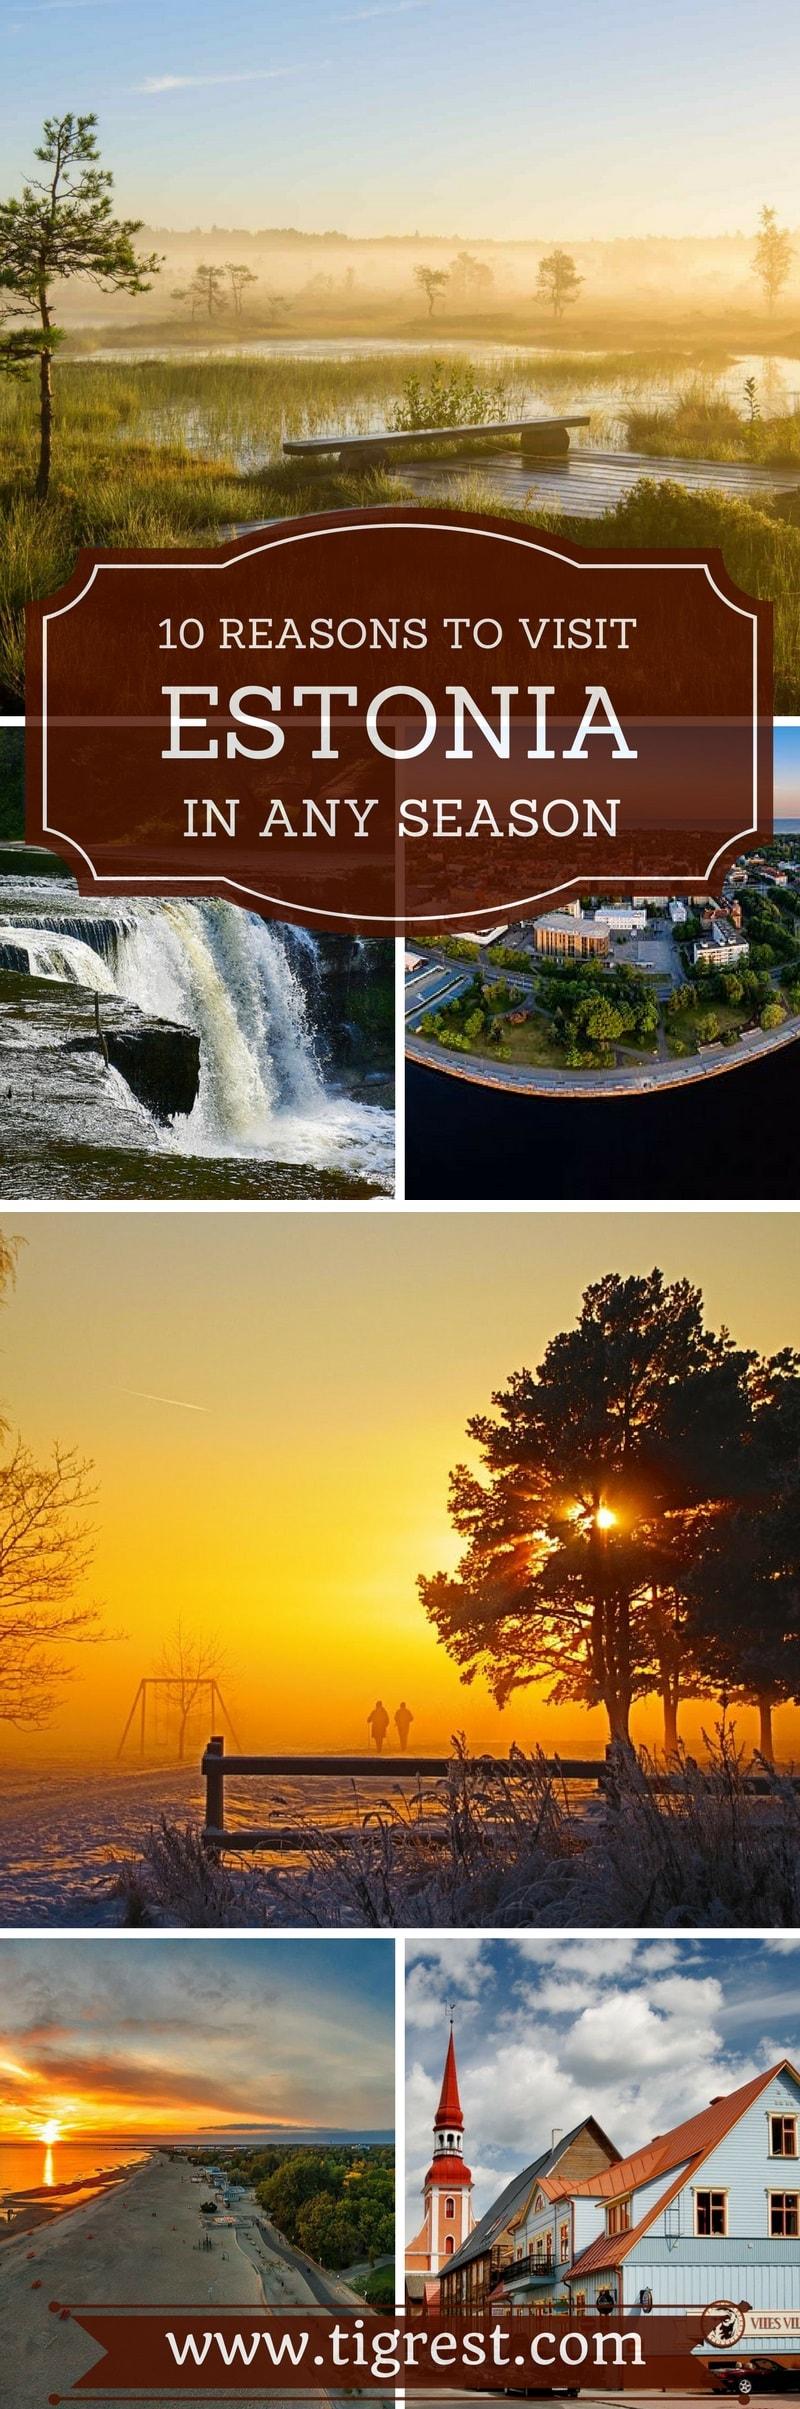 reasons for visiting Estonia pinterest